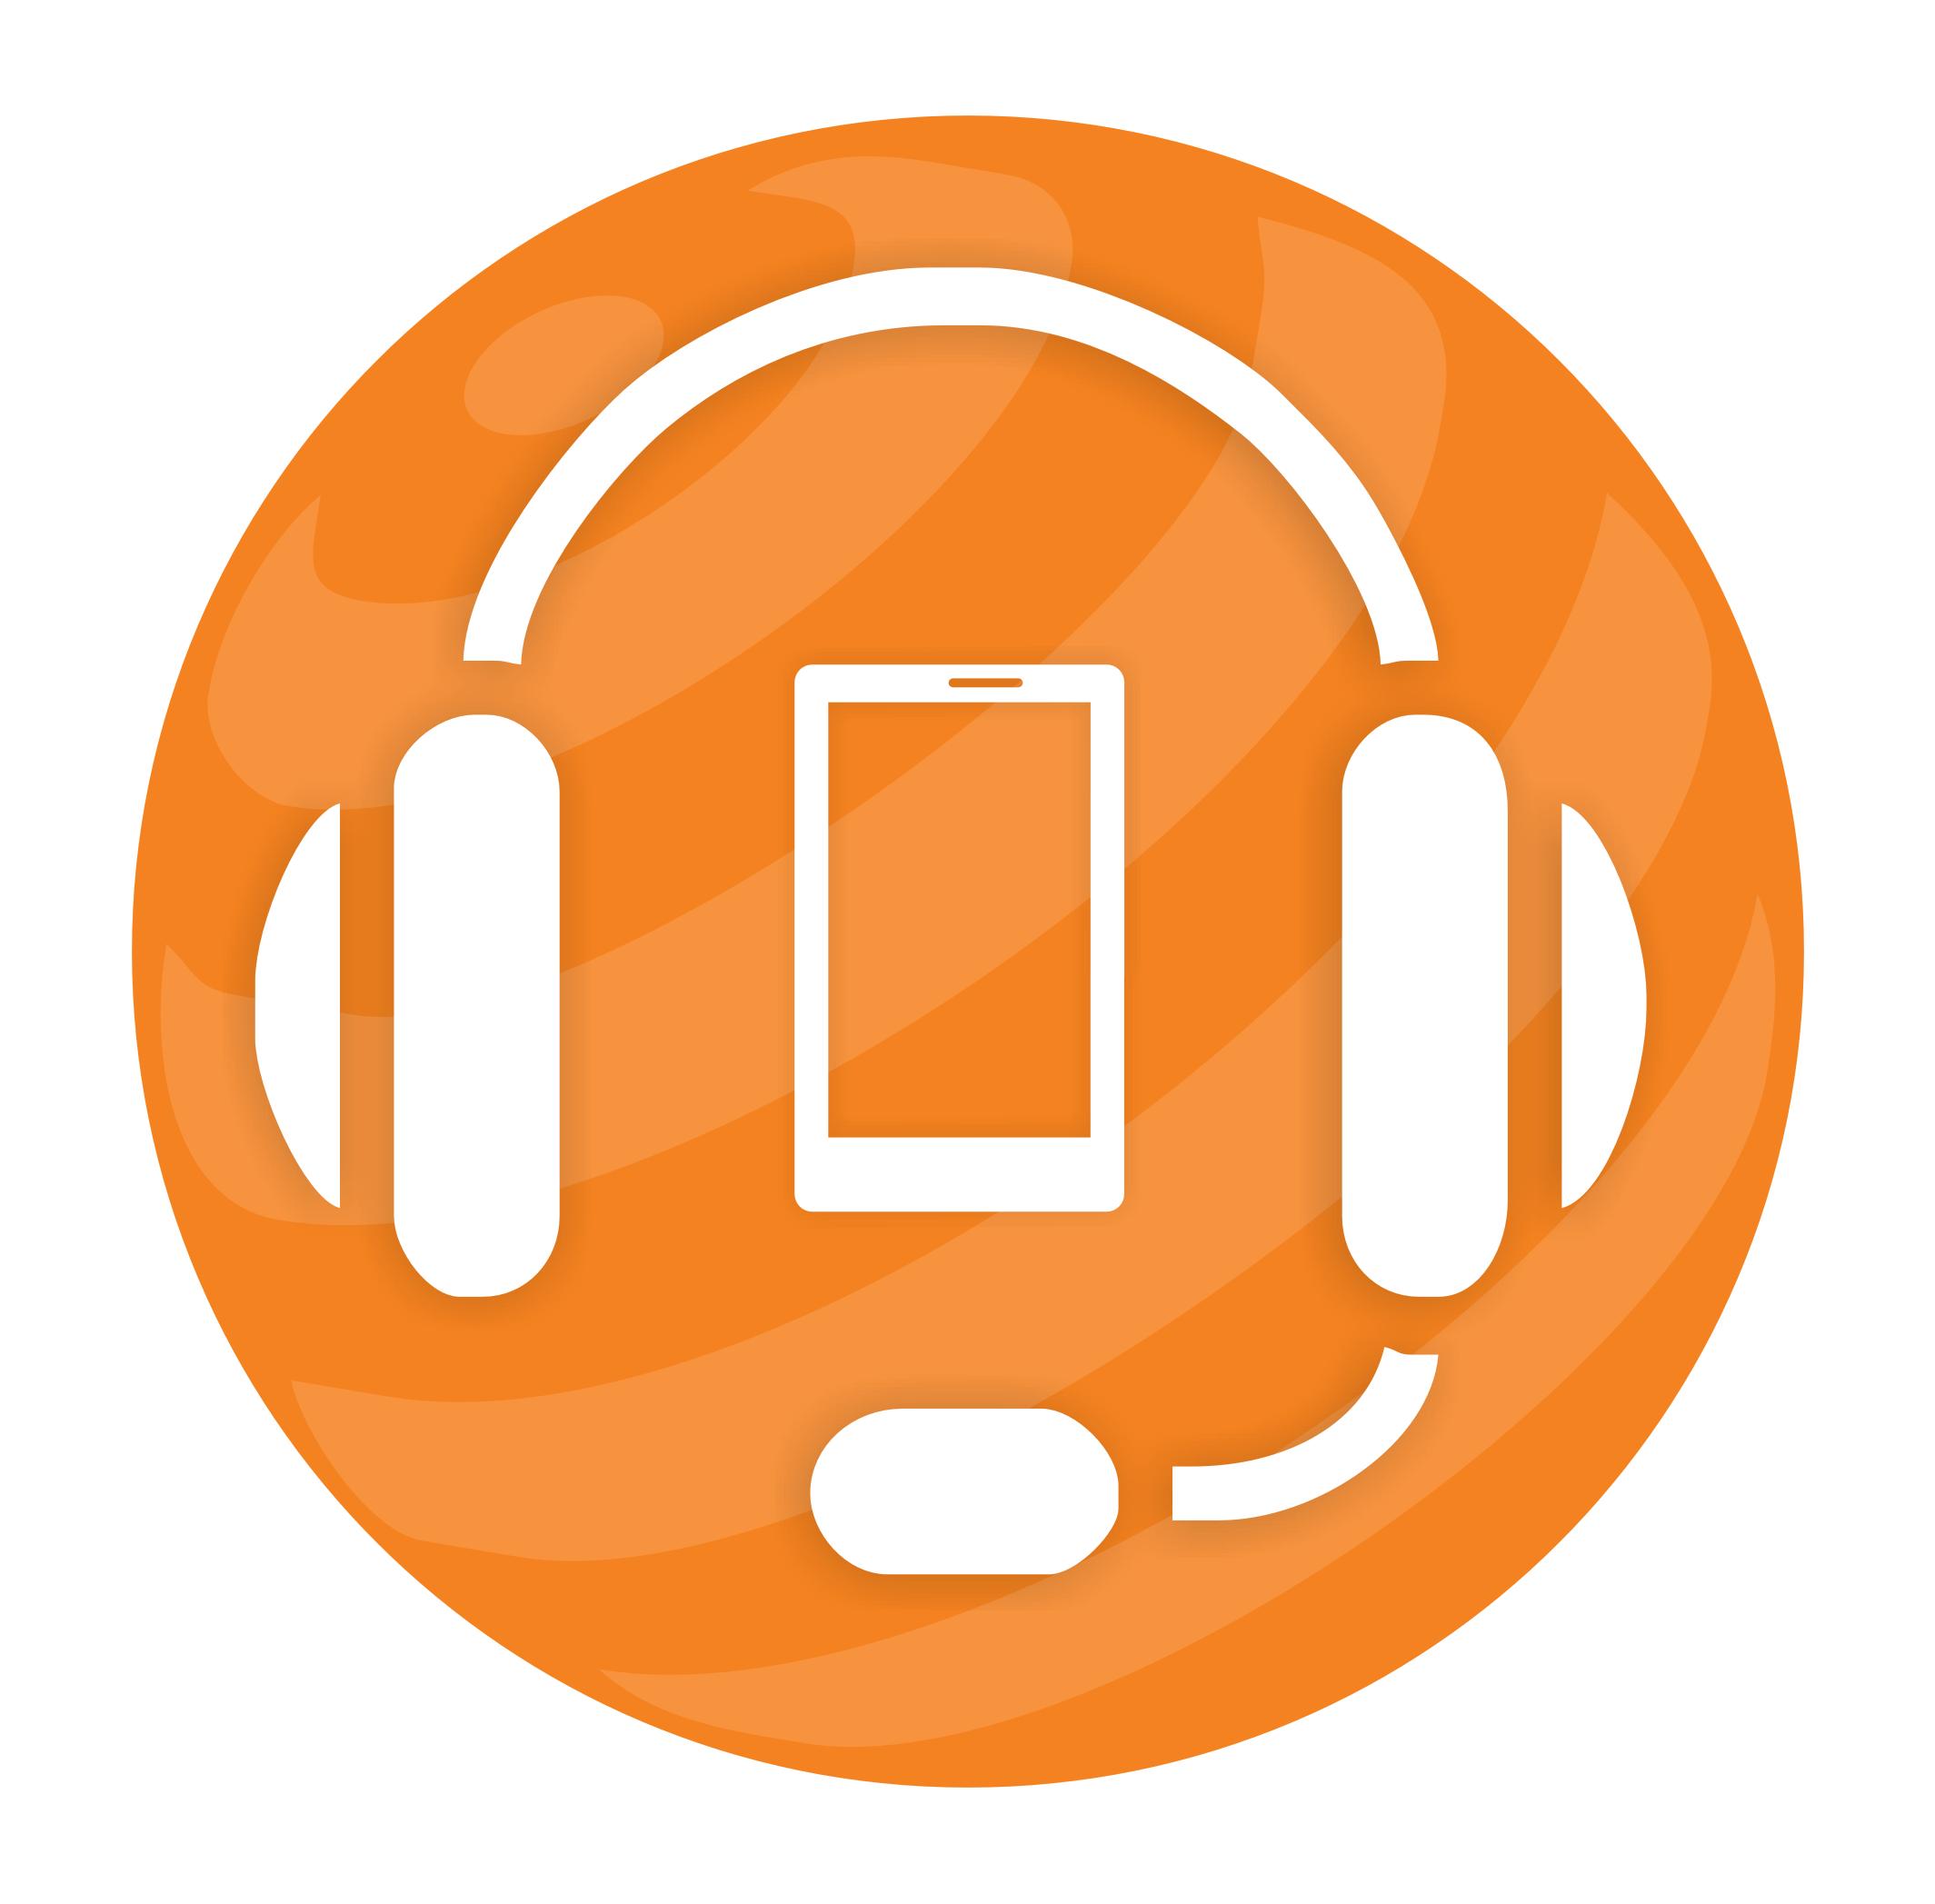 Voicebroadcast